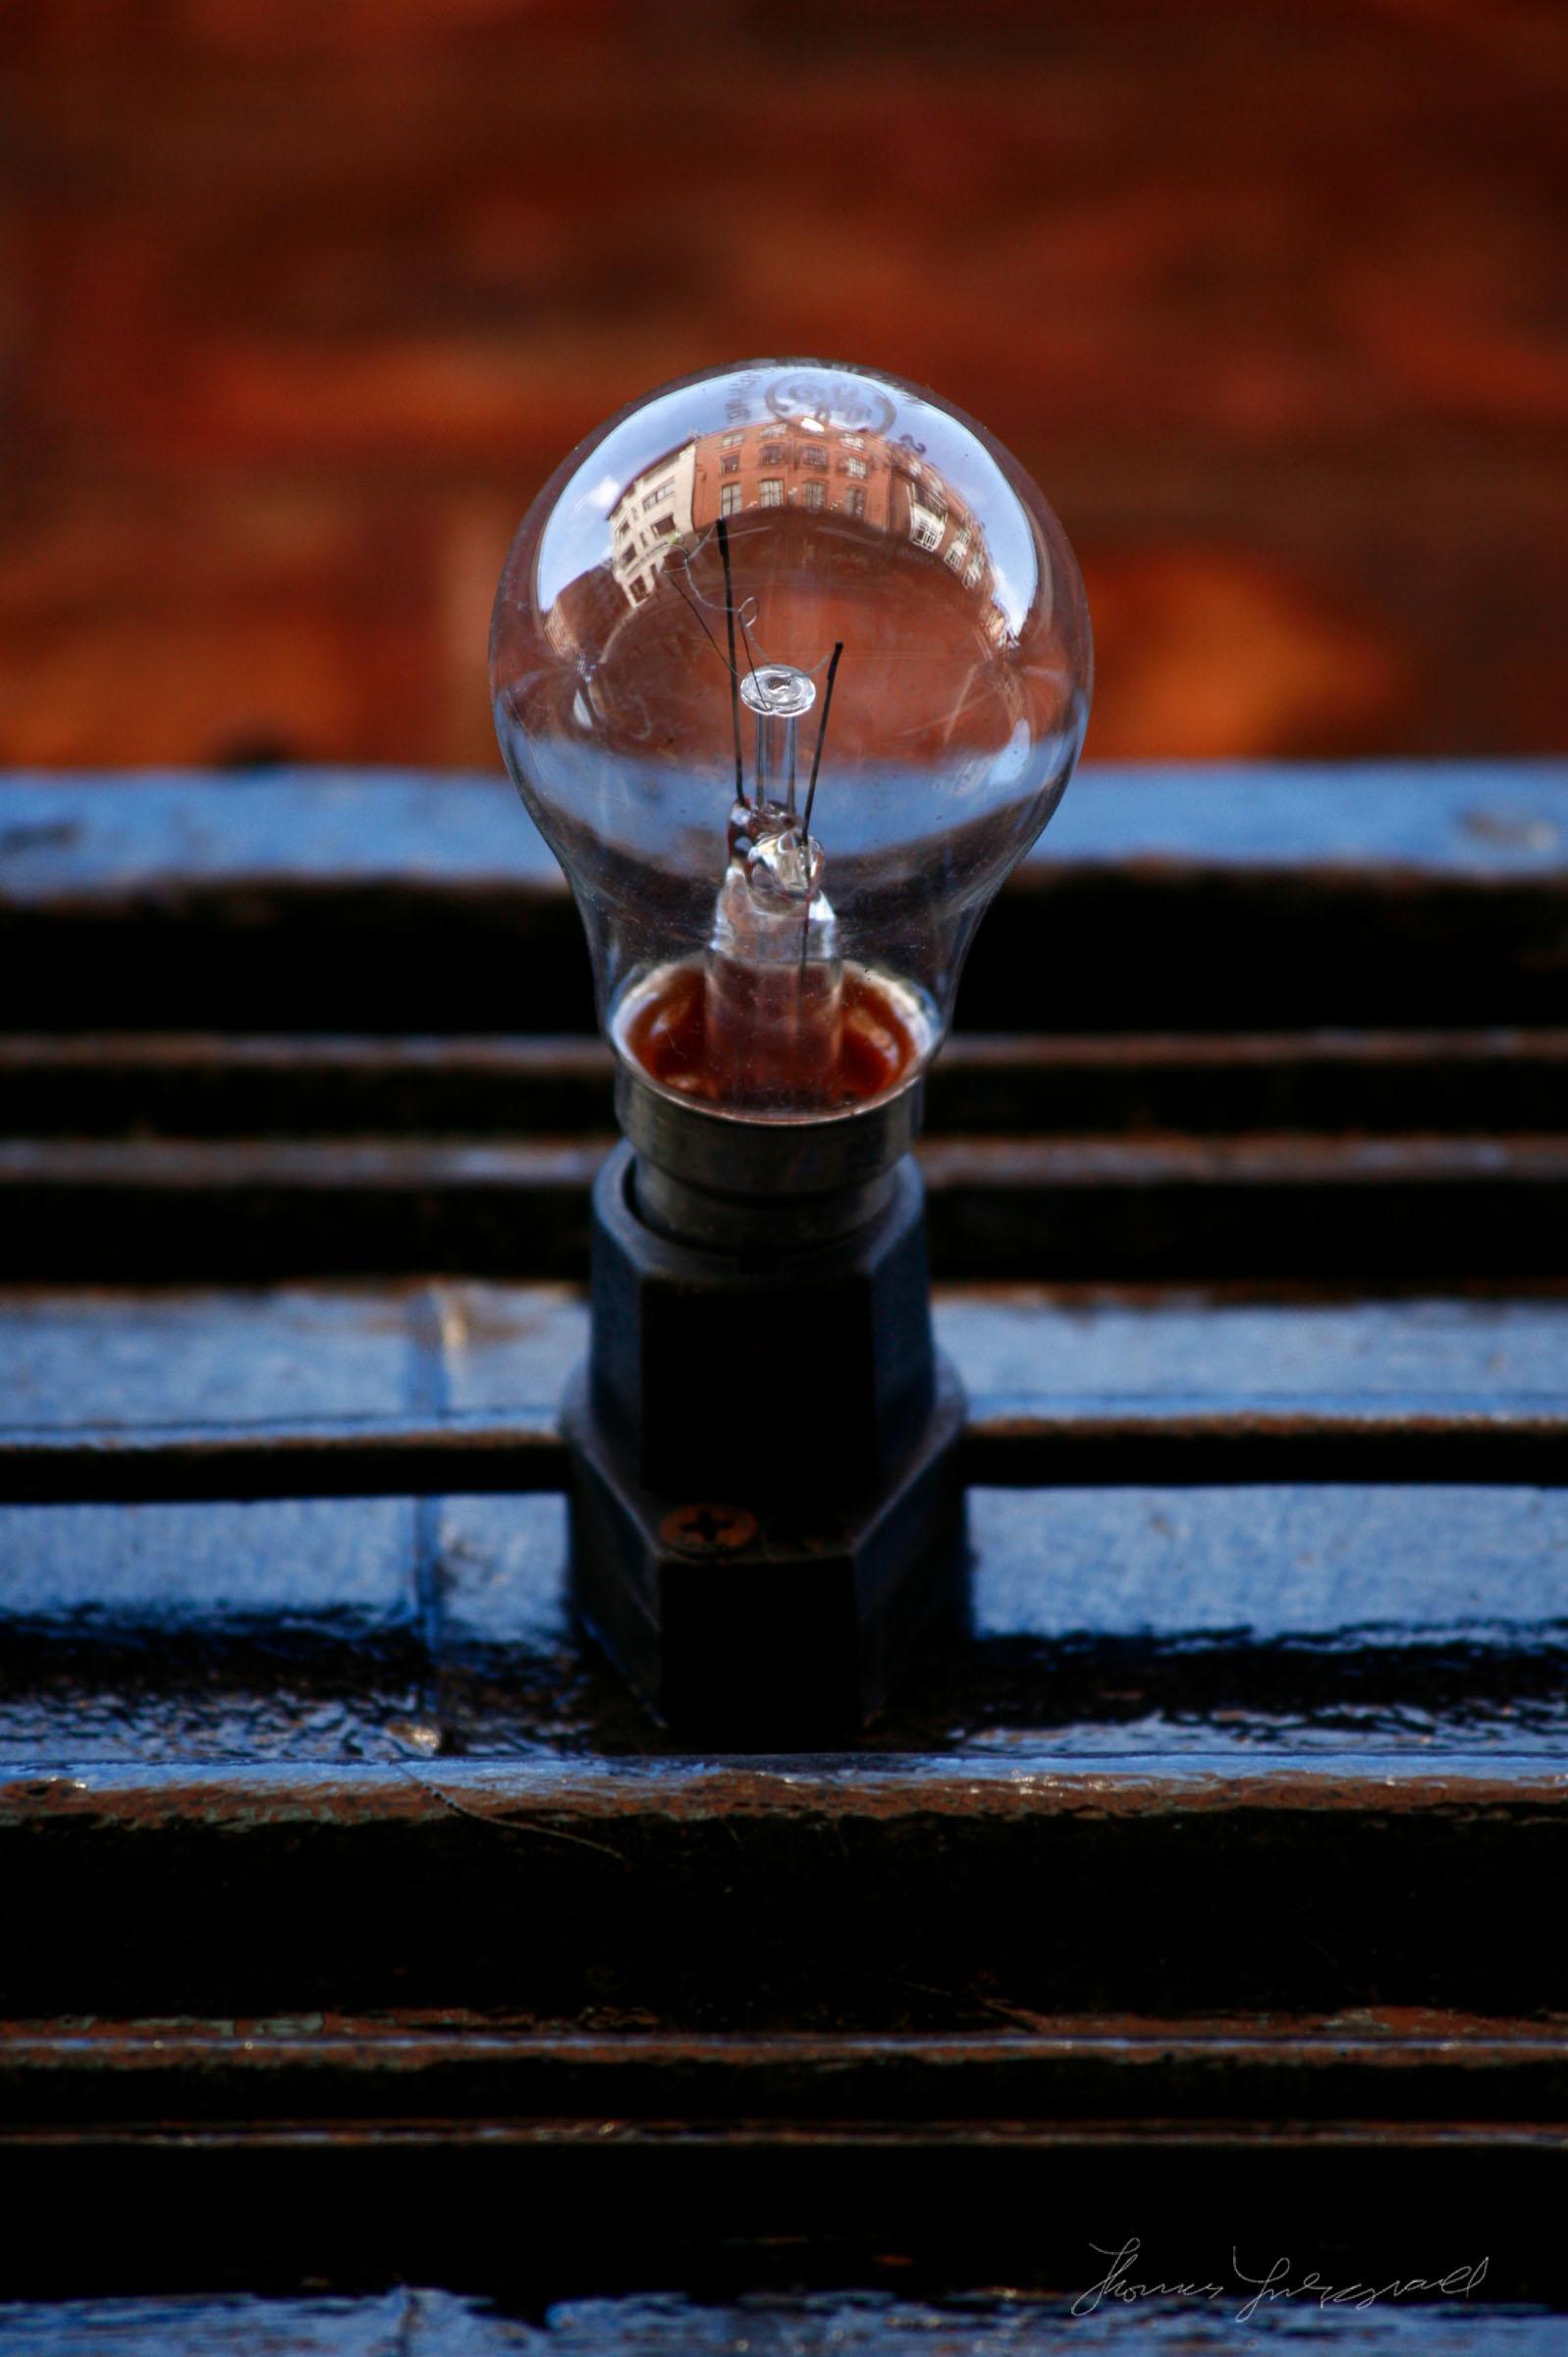 Reflections in Lightbulb